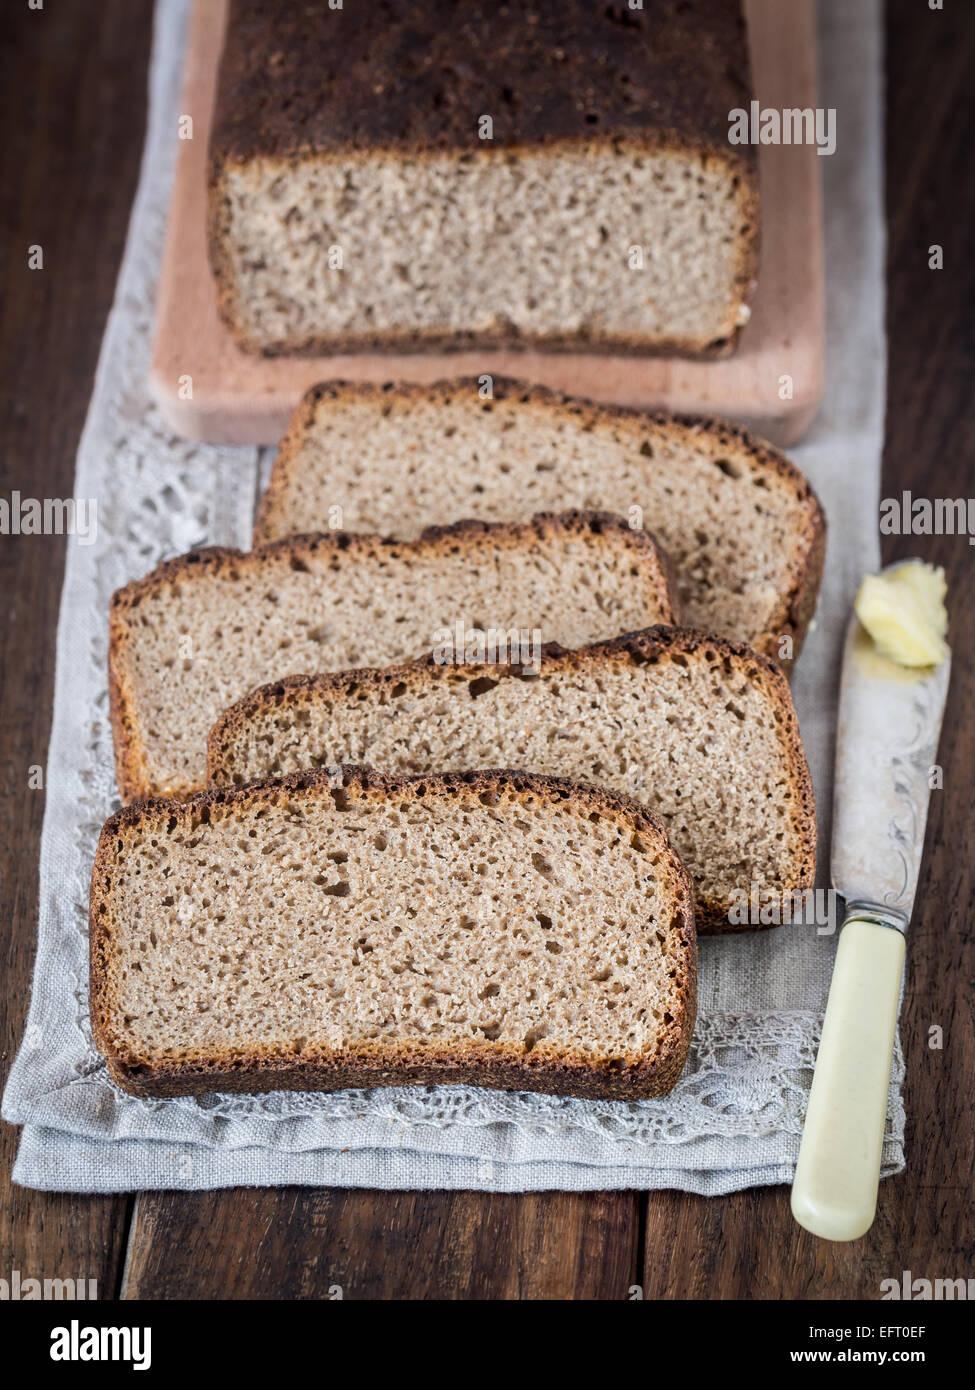 Homemade whole grain rye sourdough bread, sliced. - Stock Image